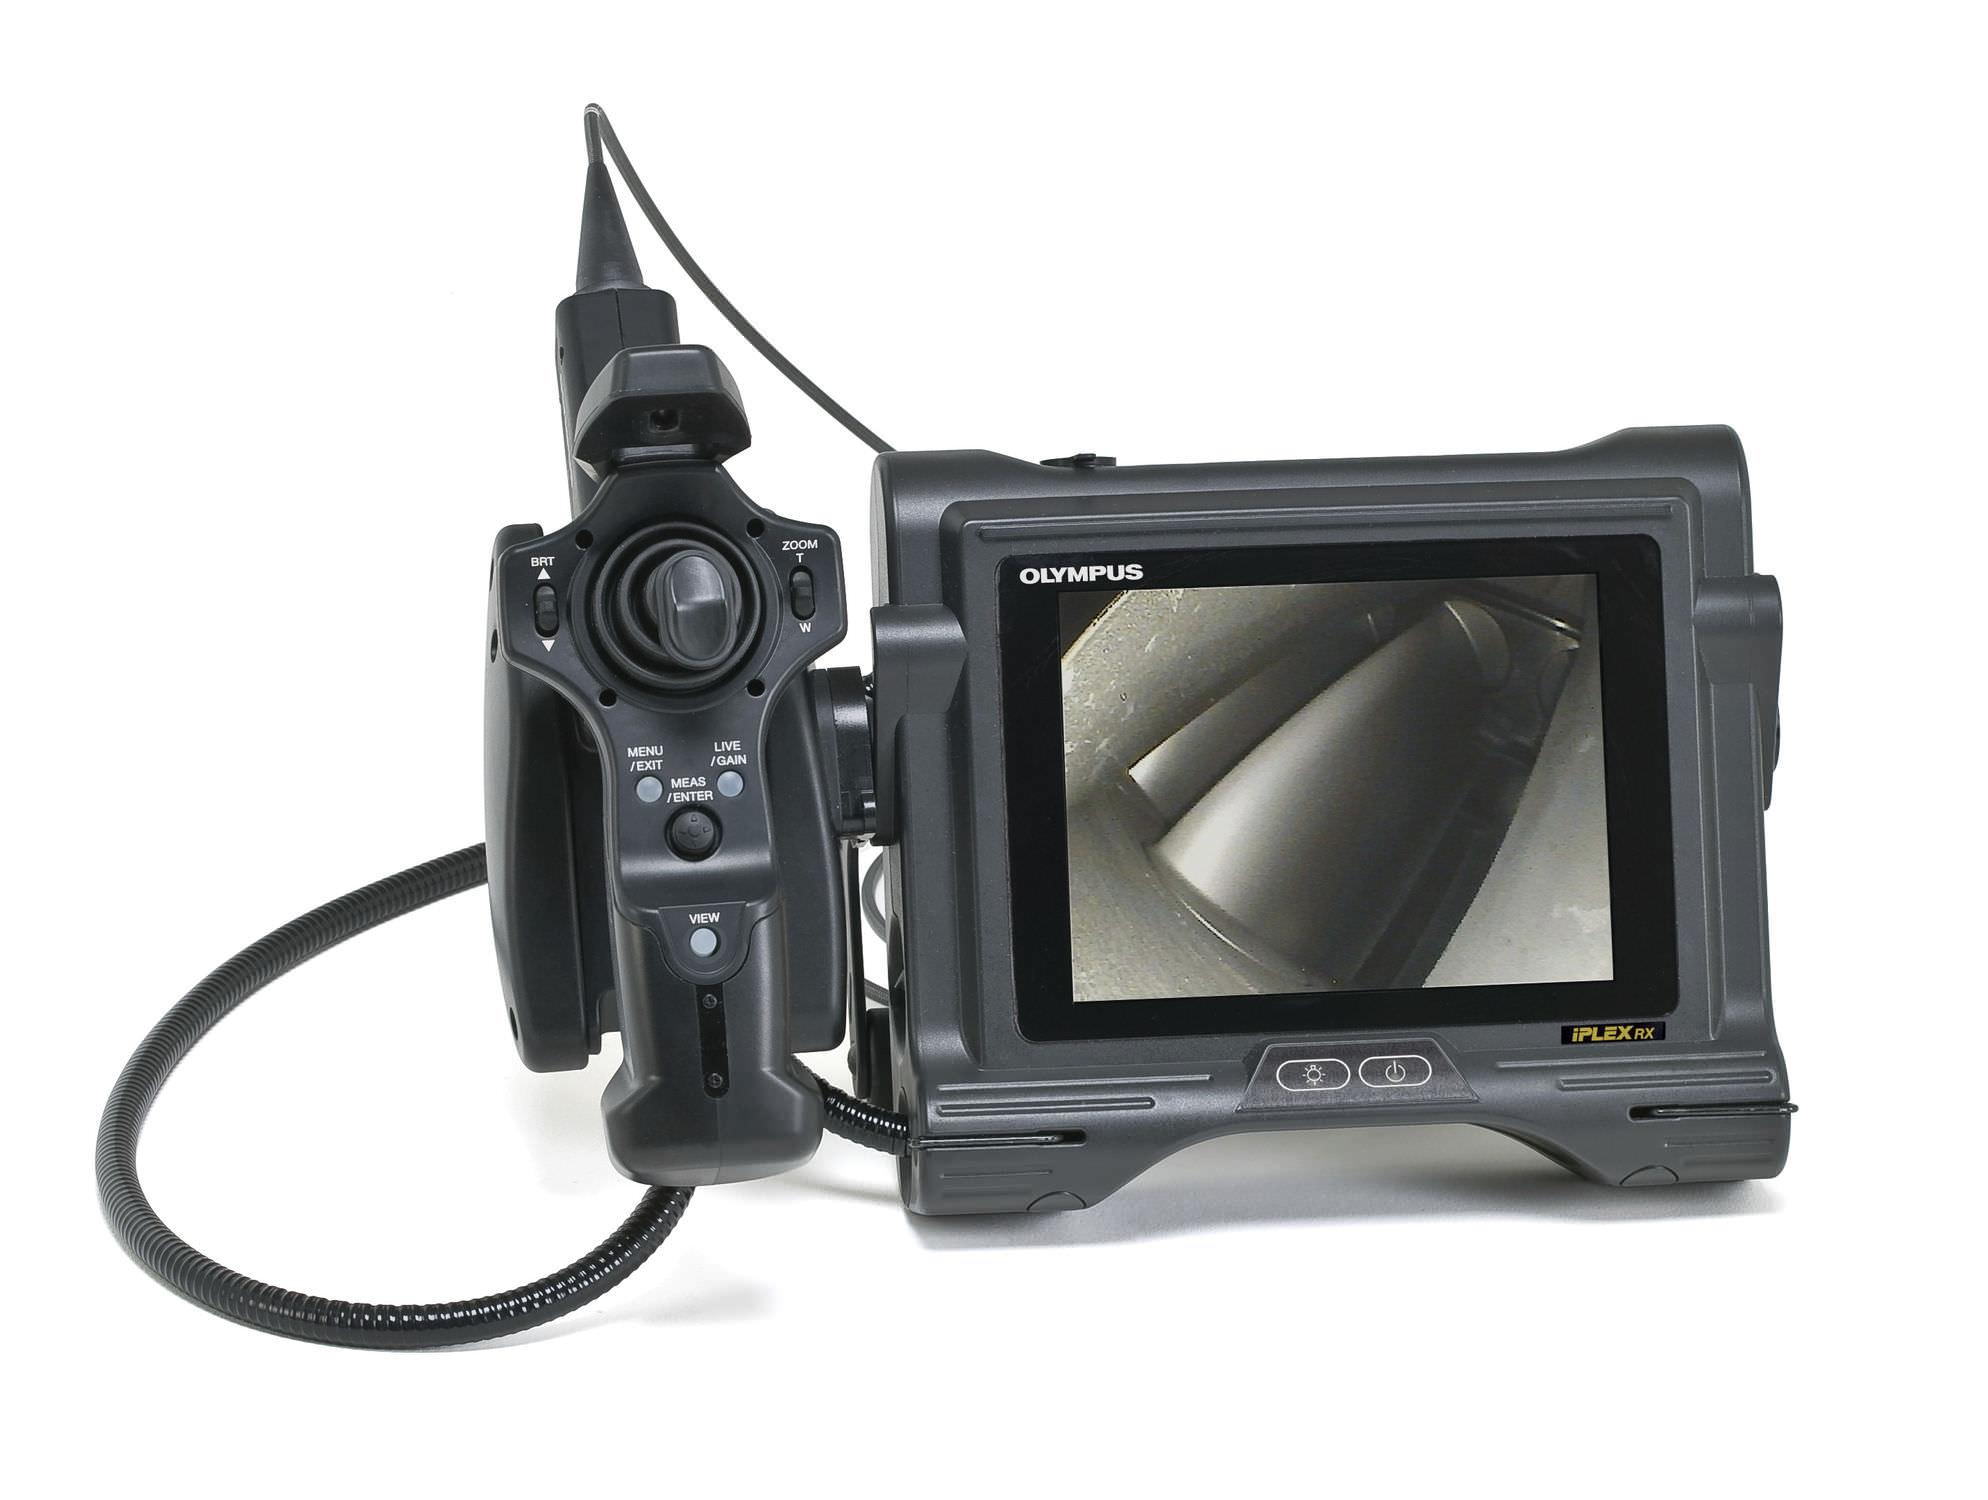 IPLEX RT - IV9650RT